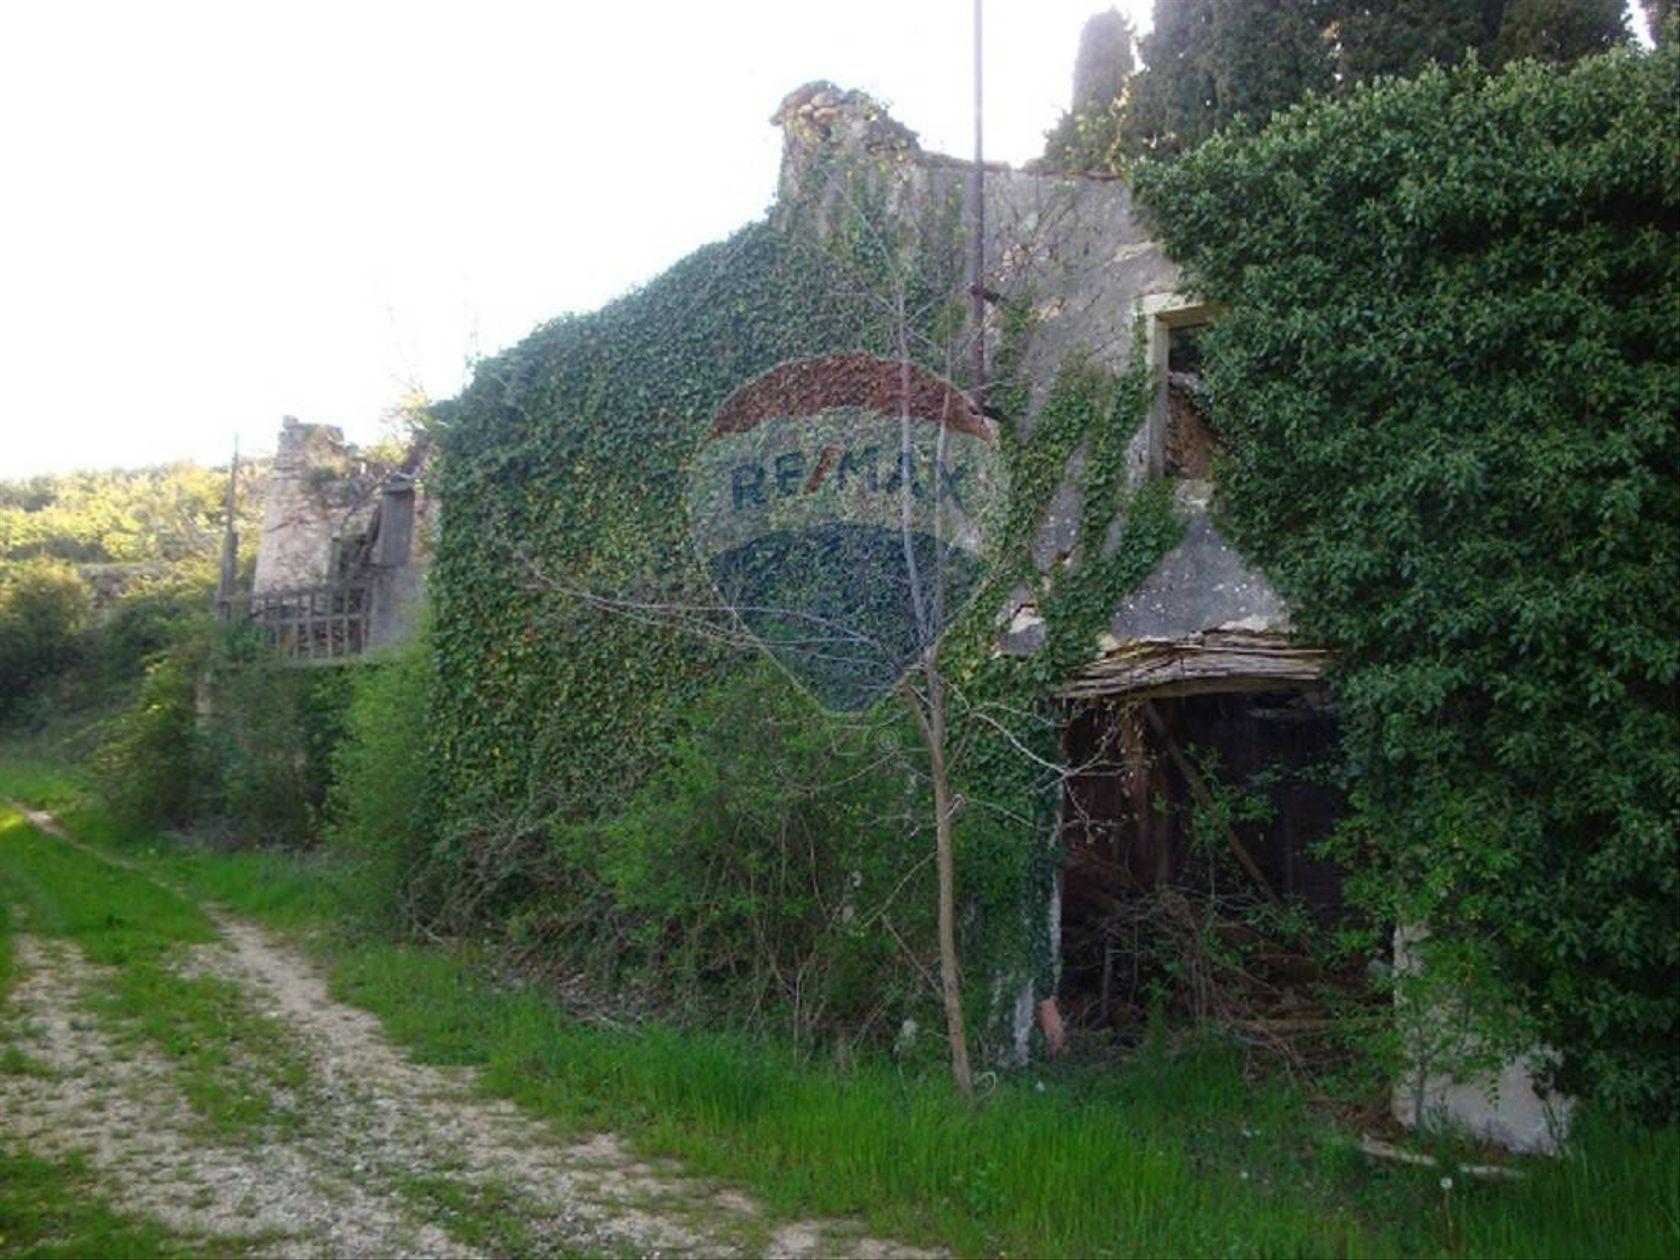 Terreno Grezzana, VR Vendita - Foto 11